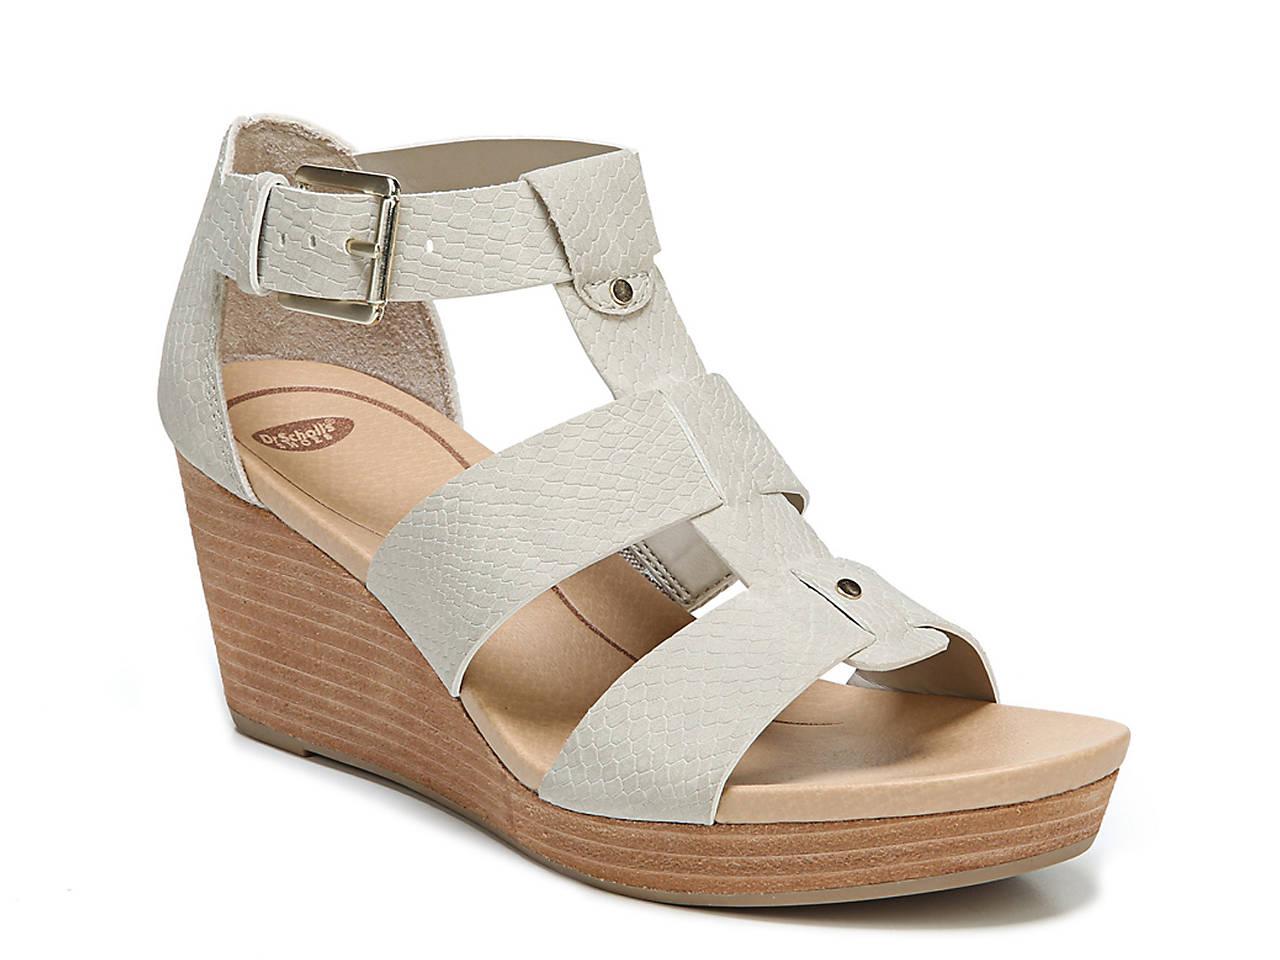 42d68caa0537 Dr. Scholl s Barton Wedge Sandal Women s Shoes